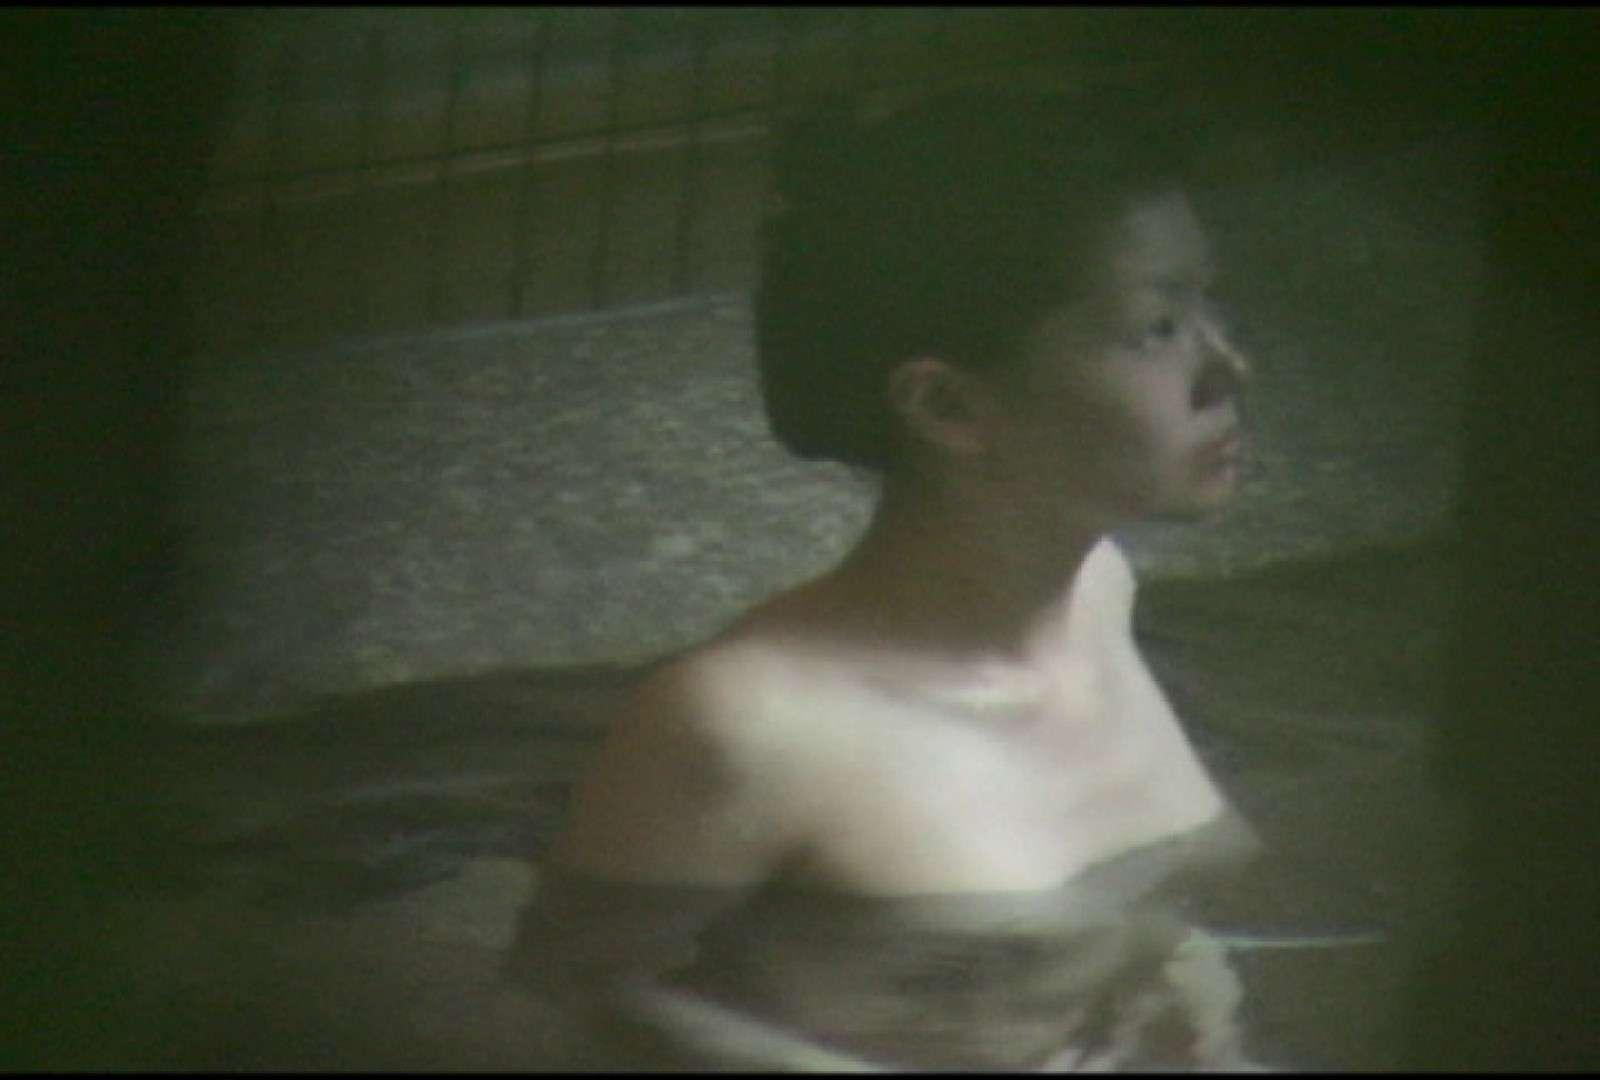 Aquaな露天風呂Vol.699 盗撮シリーズ   露天風呂編  93PIX 1